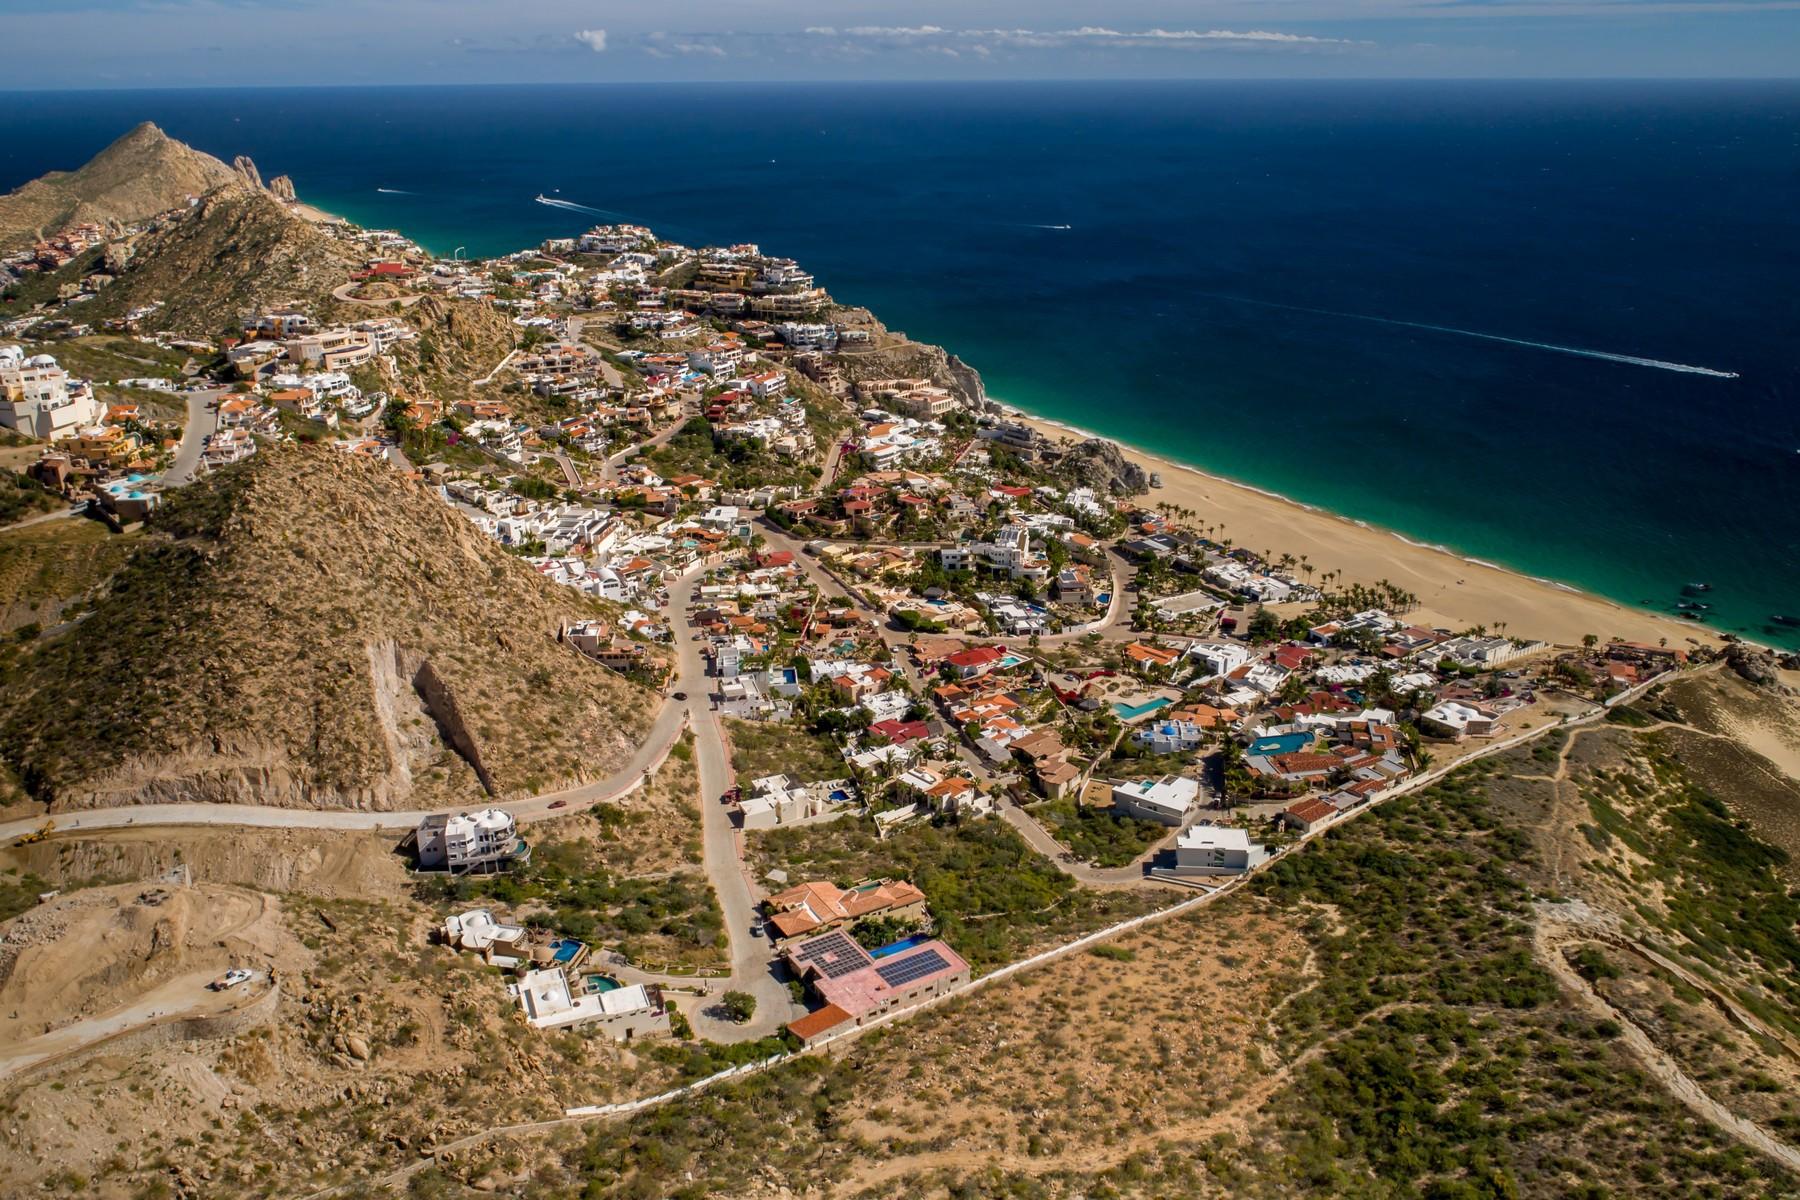 Land for Sale at Lote Pedregal Camino del Sol 25 Lote #25 Manzana 36, Calle Camino del Sol Pedregal de Cabo San Lucas Cabo San Lucas, Baja California Sur 23453 Mexico